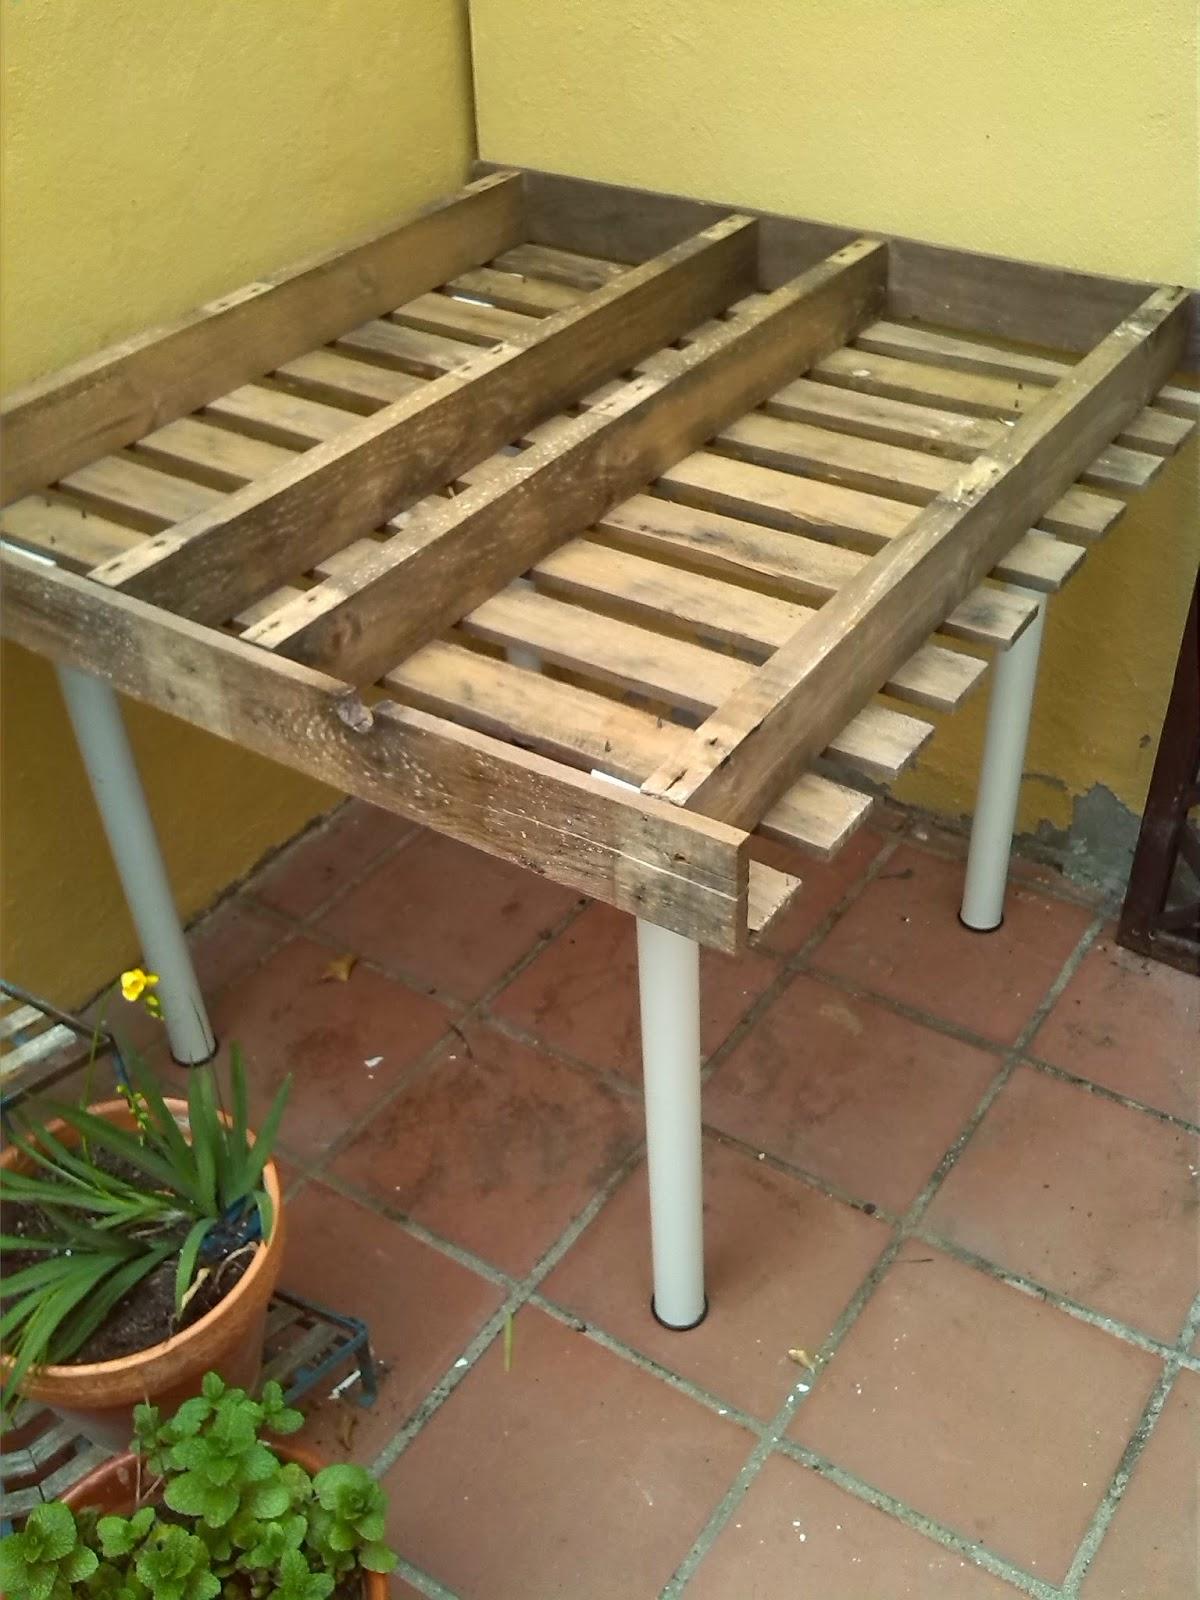 Servilletas decoupage nenoska mesa de cultivo reciclaje - Drenaje mesa de cultivo ...